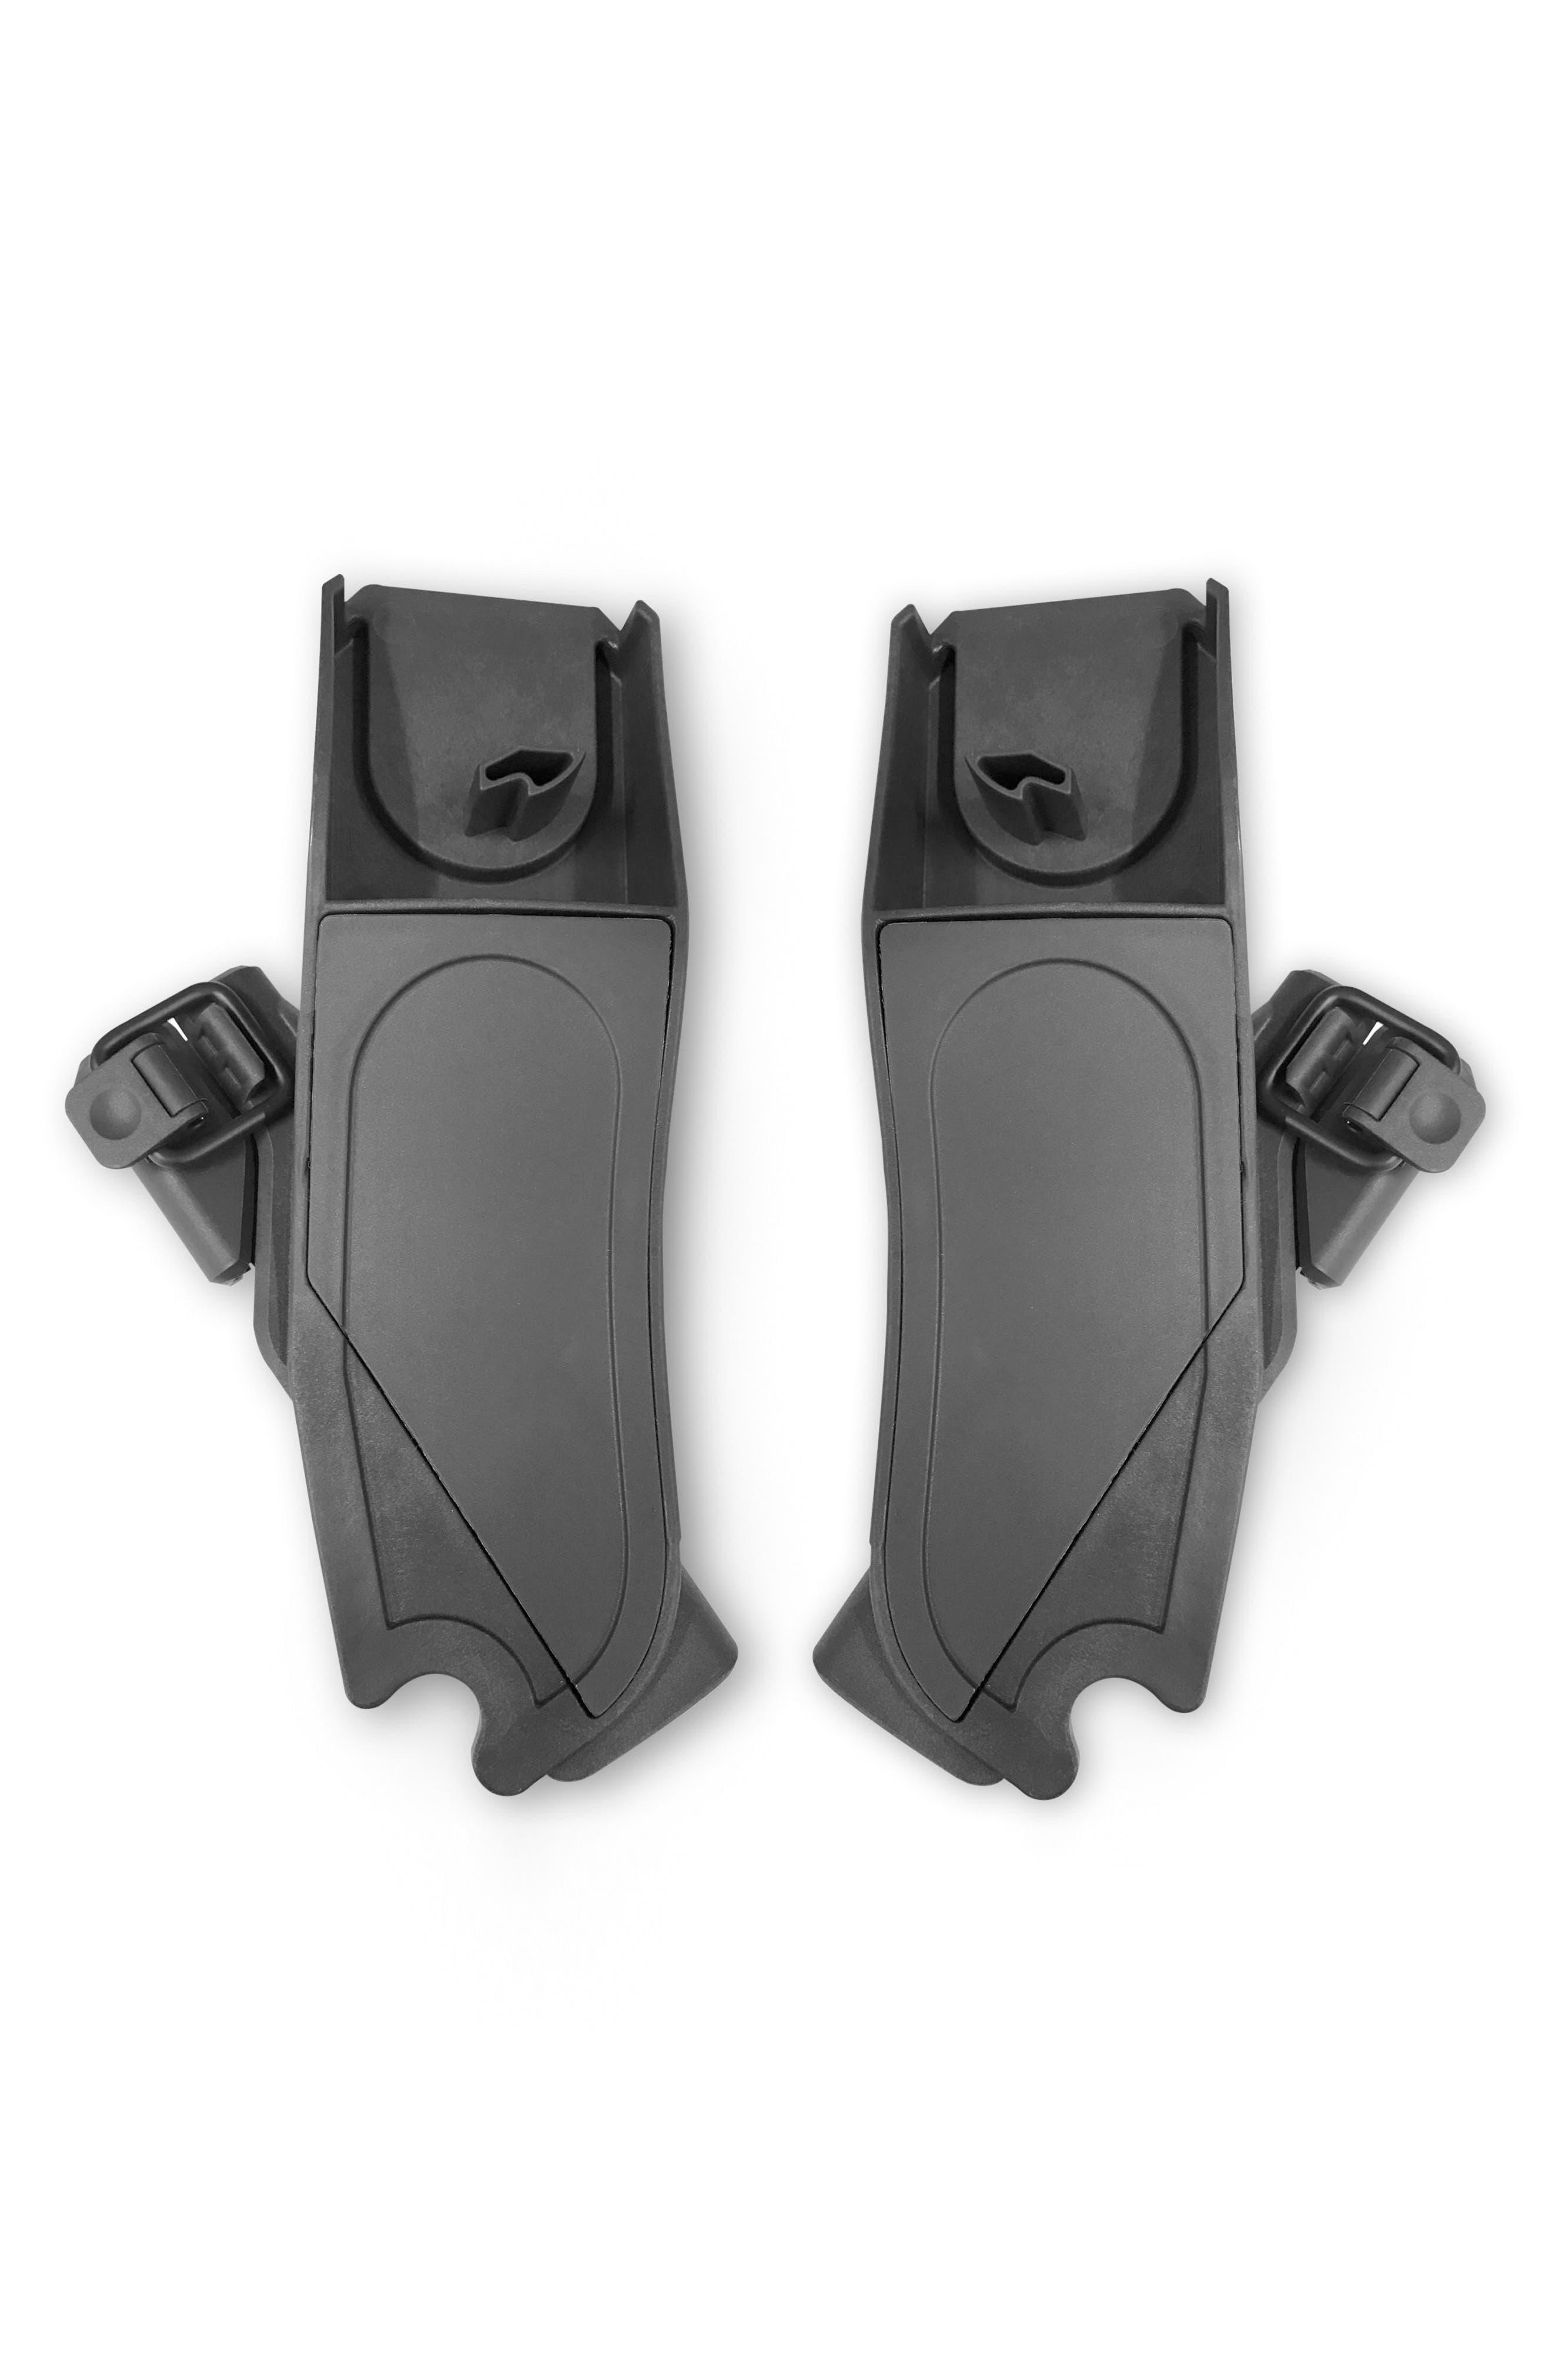 Lower Maxi-Cosi<sup>®</sup>/Nuna Car Seat Adapter,                         Main,                         color, BLACK